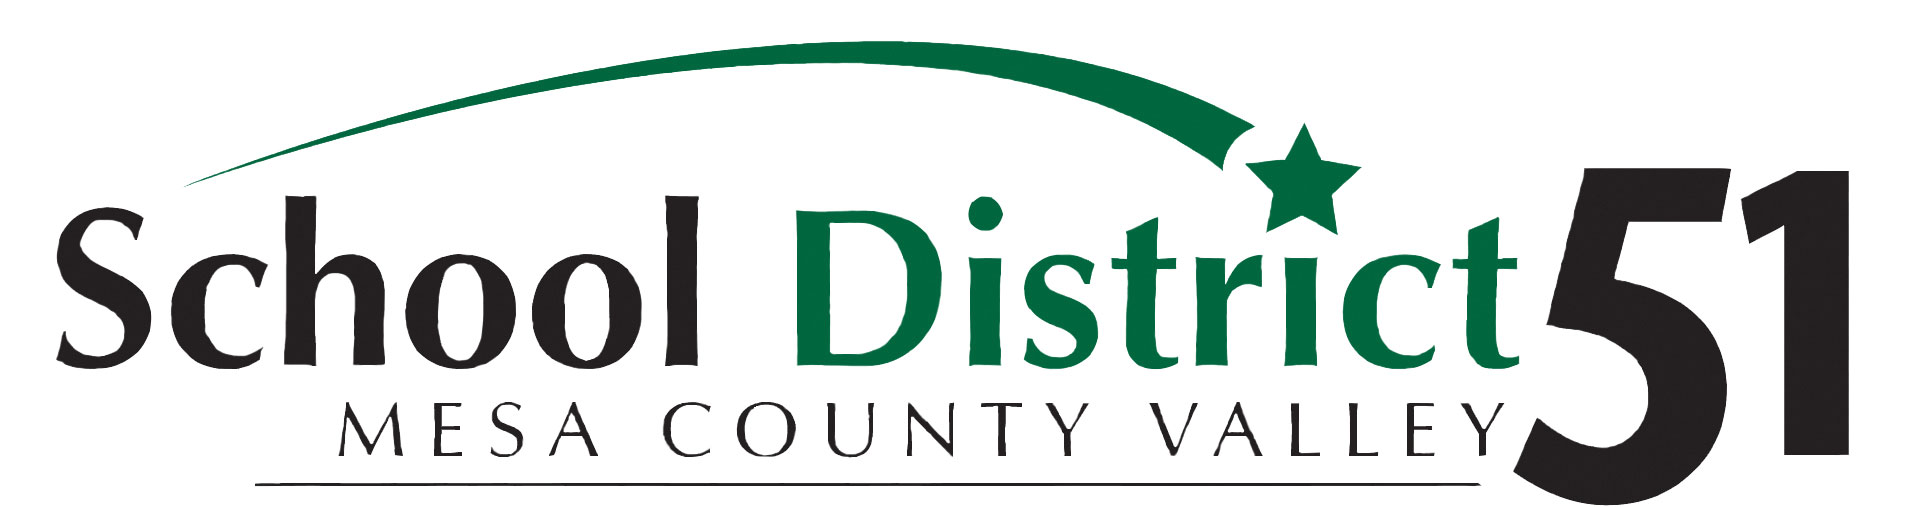 Mesa County Valley School District 51